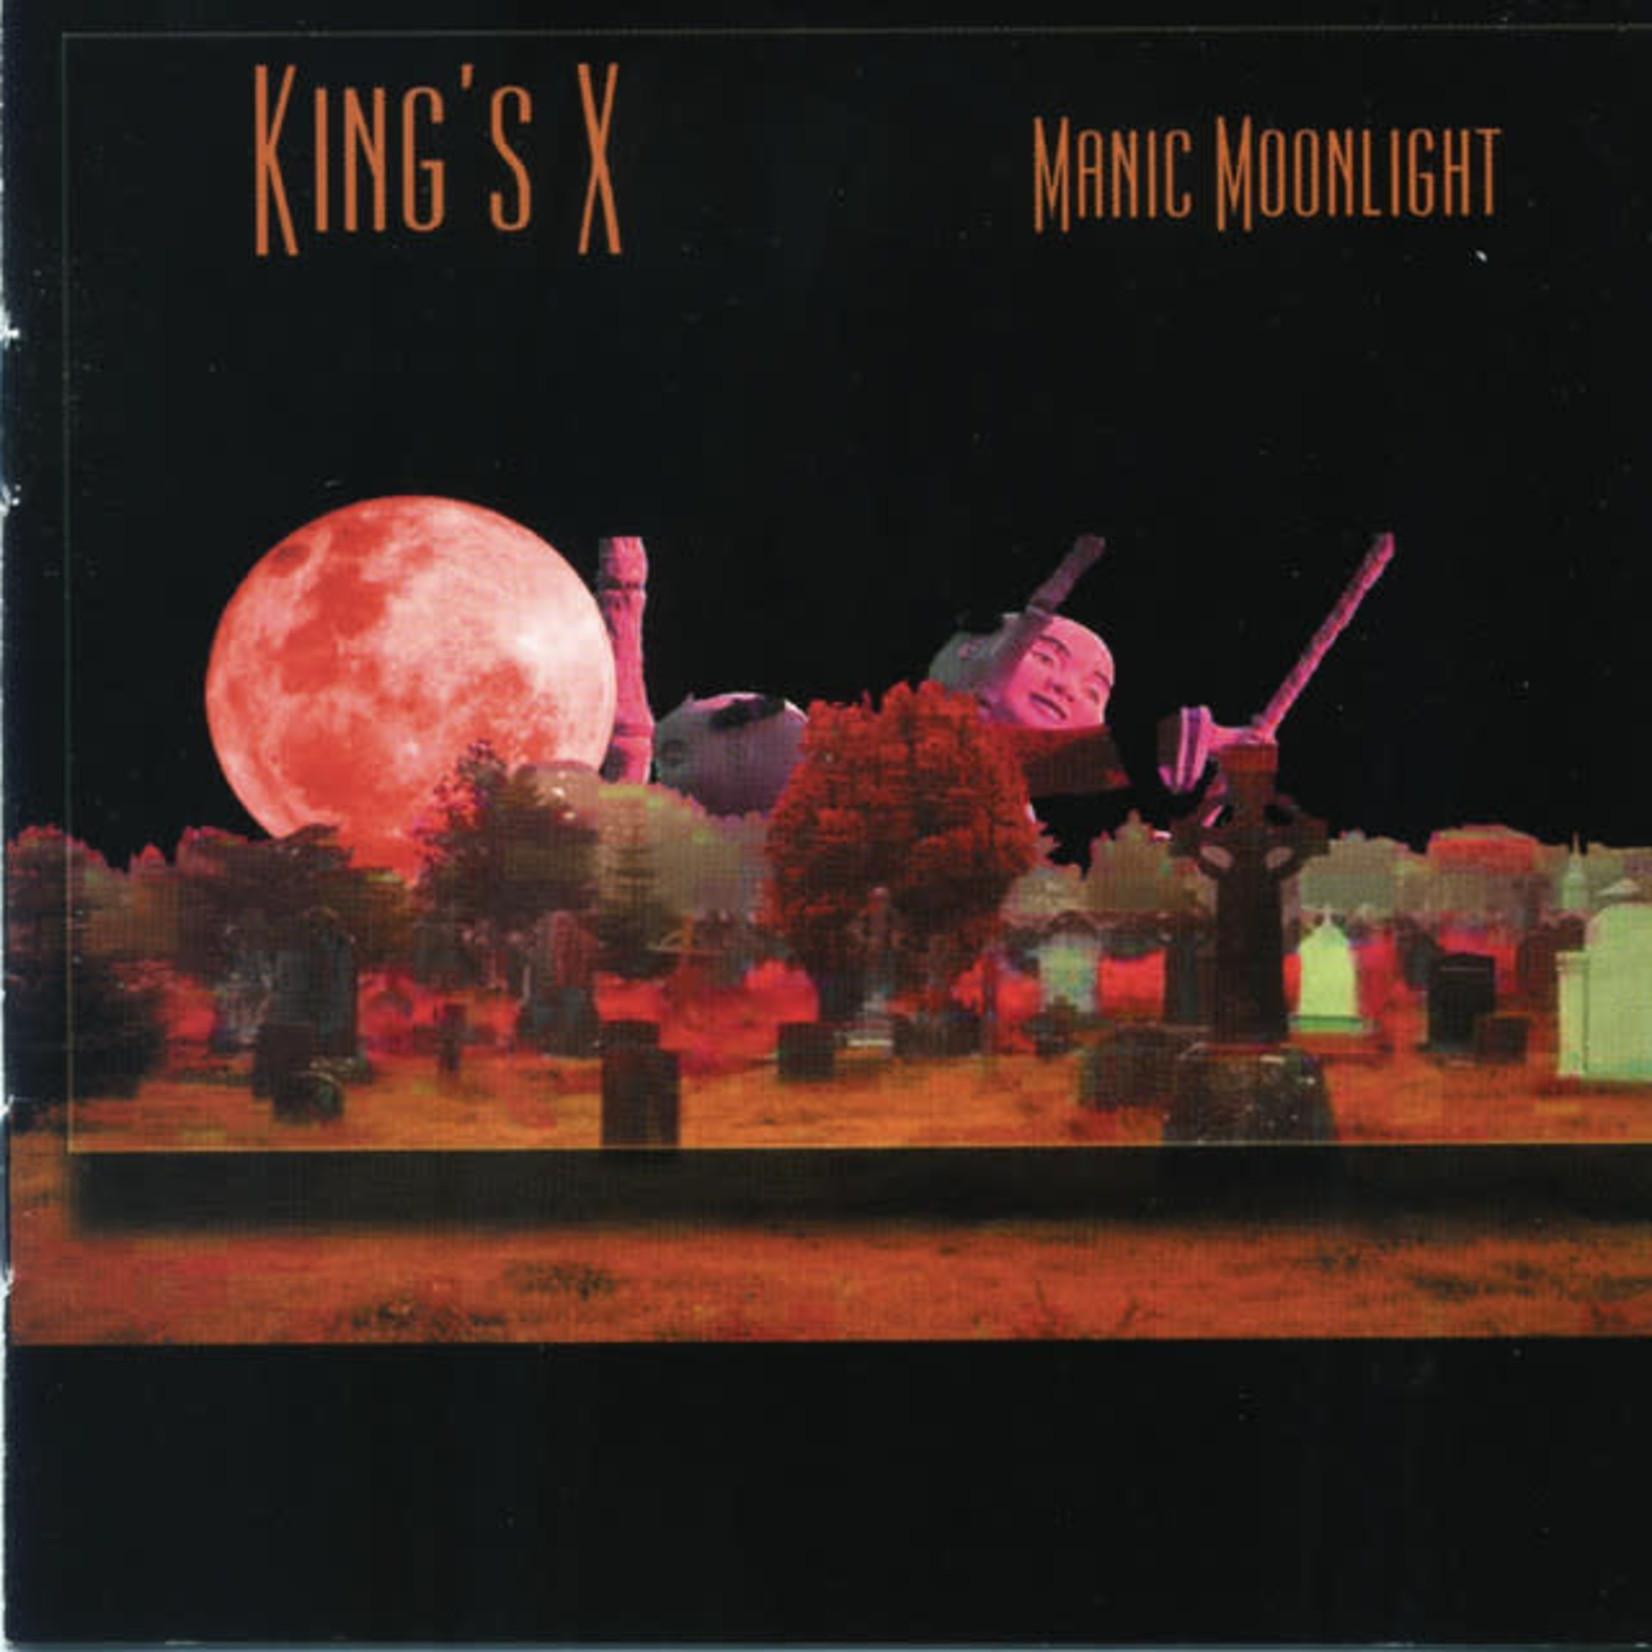 Vinyl King's X - Manic Moonlight RSD 2021